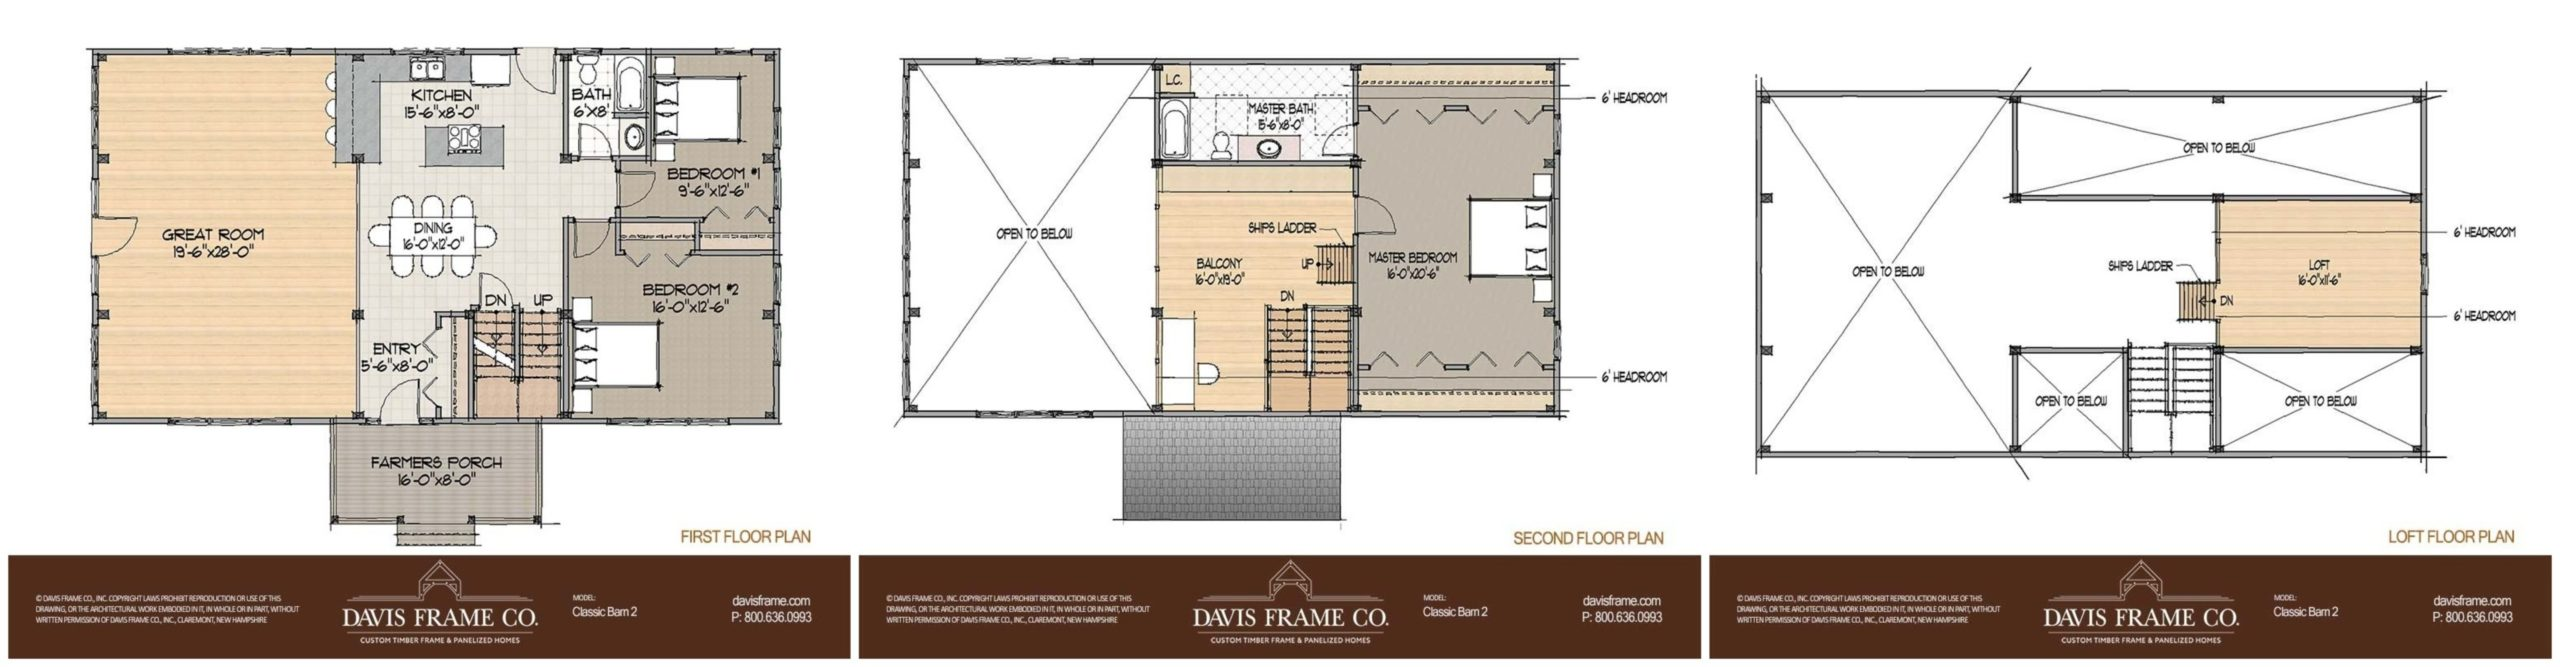 classic barn home 2 floor plan